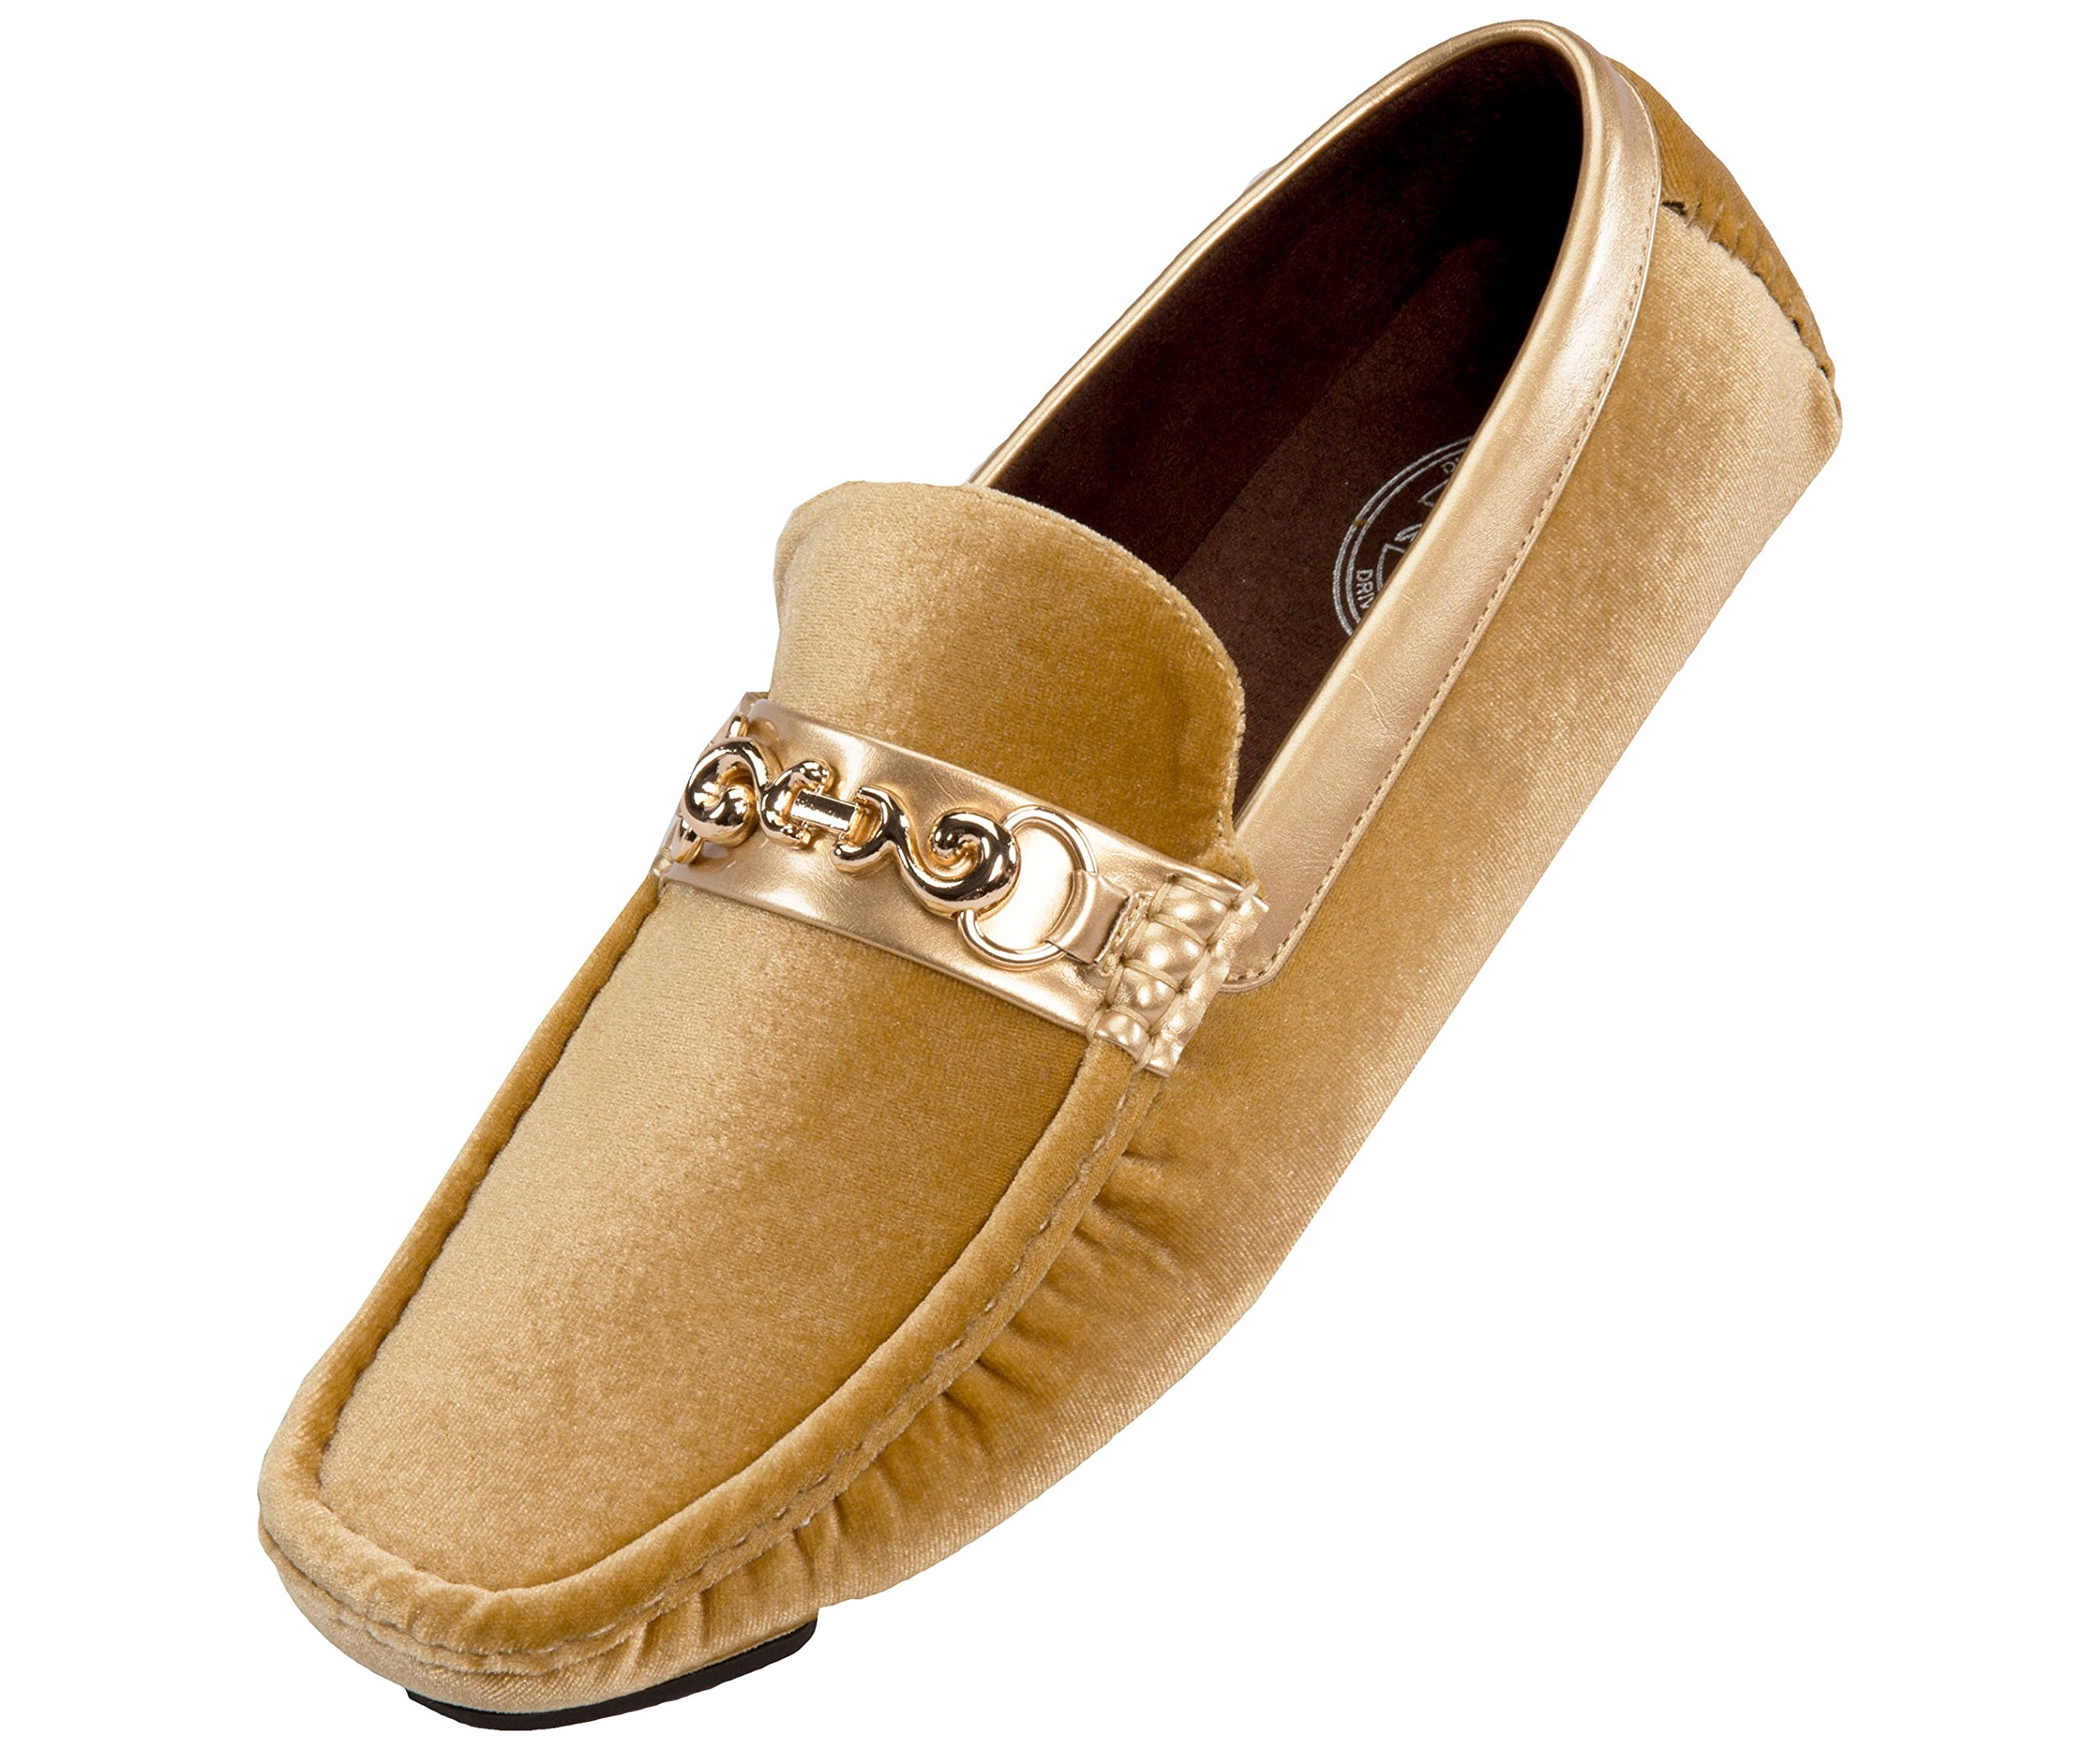 750667759e9 Amali Men s Velvet Loafer Smoking Slipper Dress Shoe with Embellished Bit  Style Piero